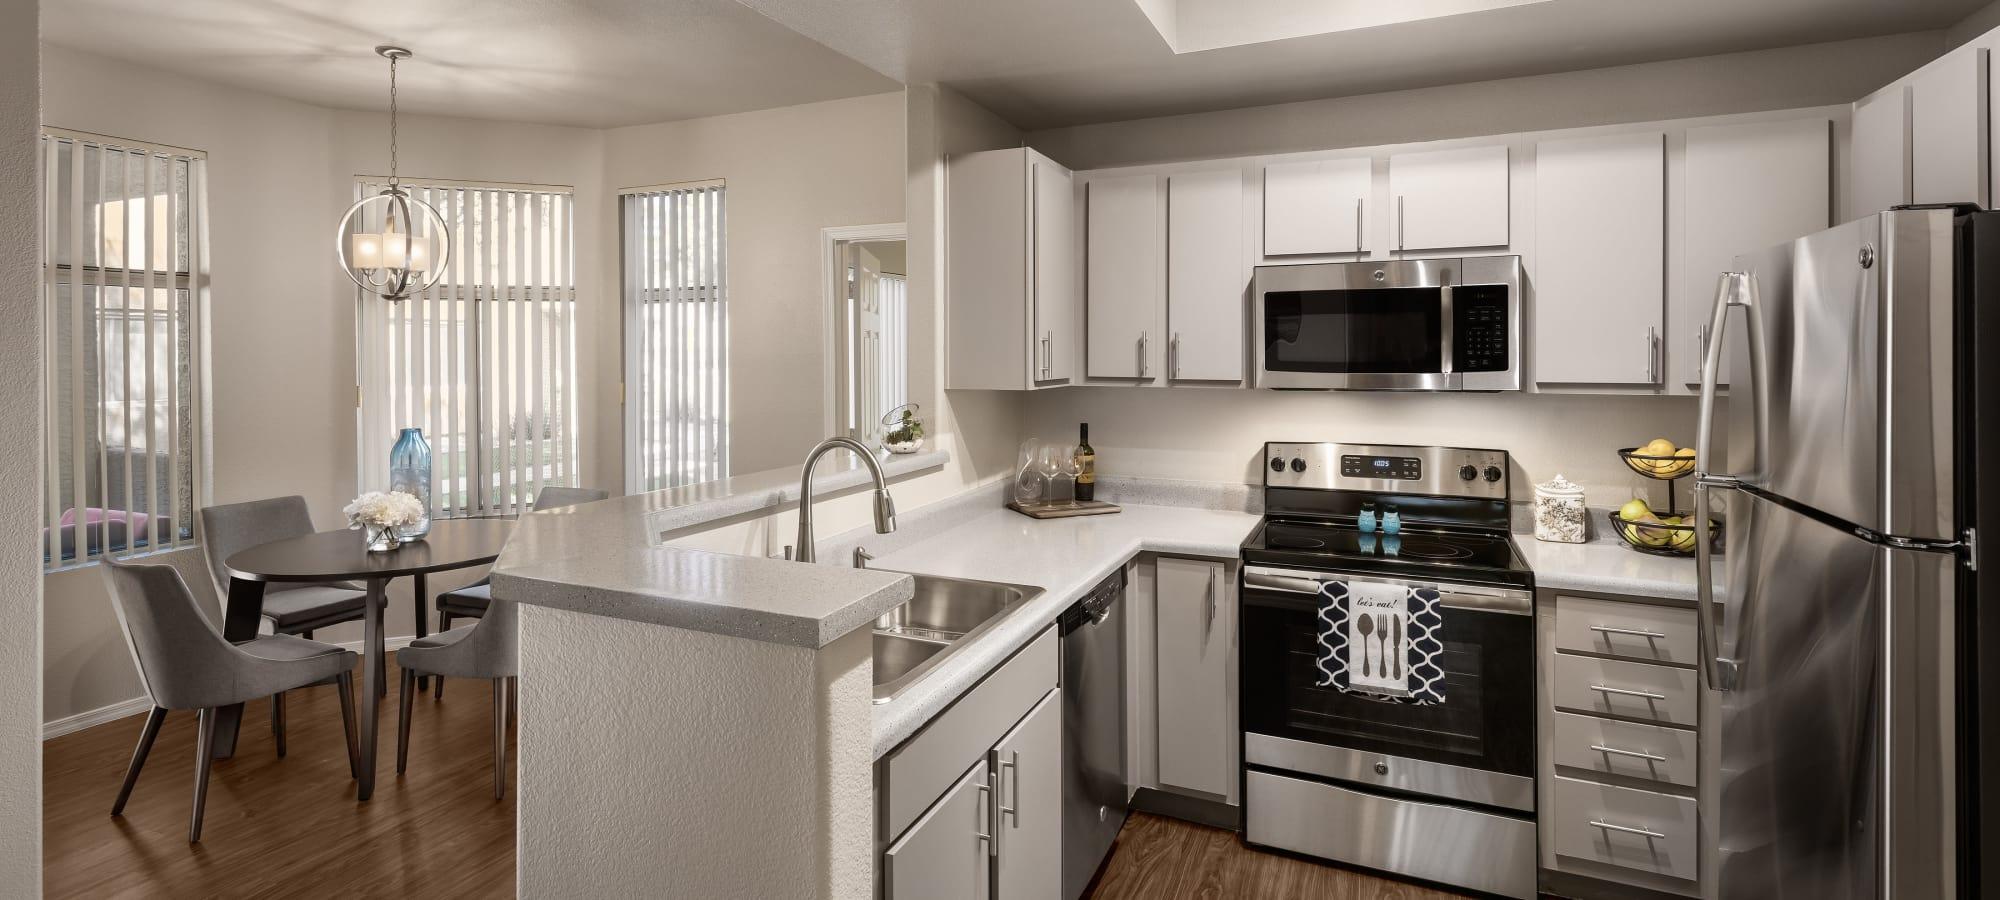 Open kitchen with granite counter tops at Bellagio in Scottsdale, Arizona